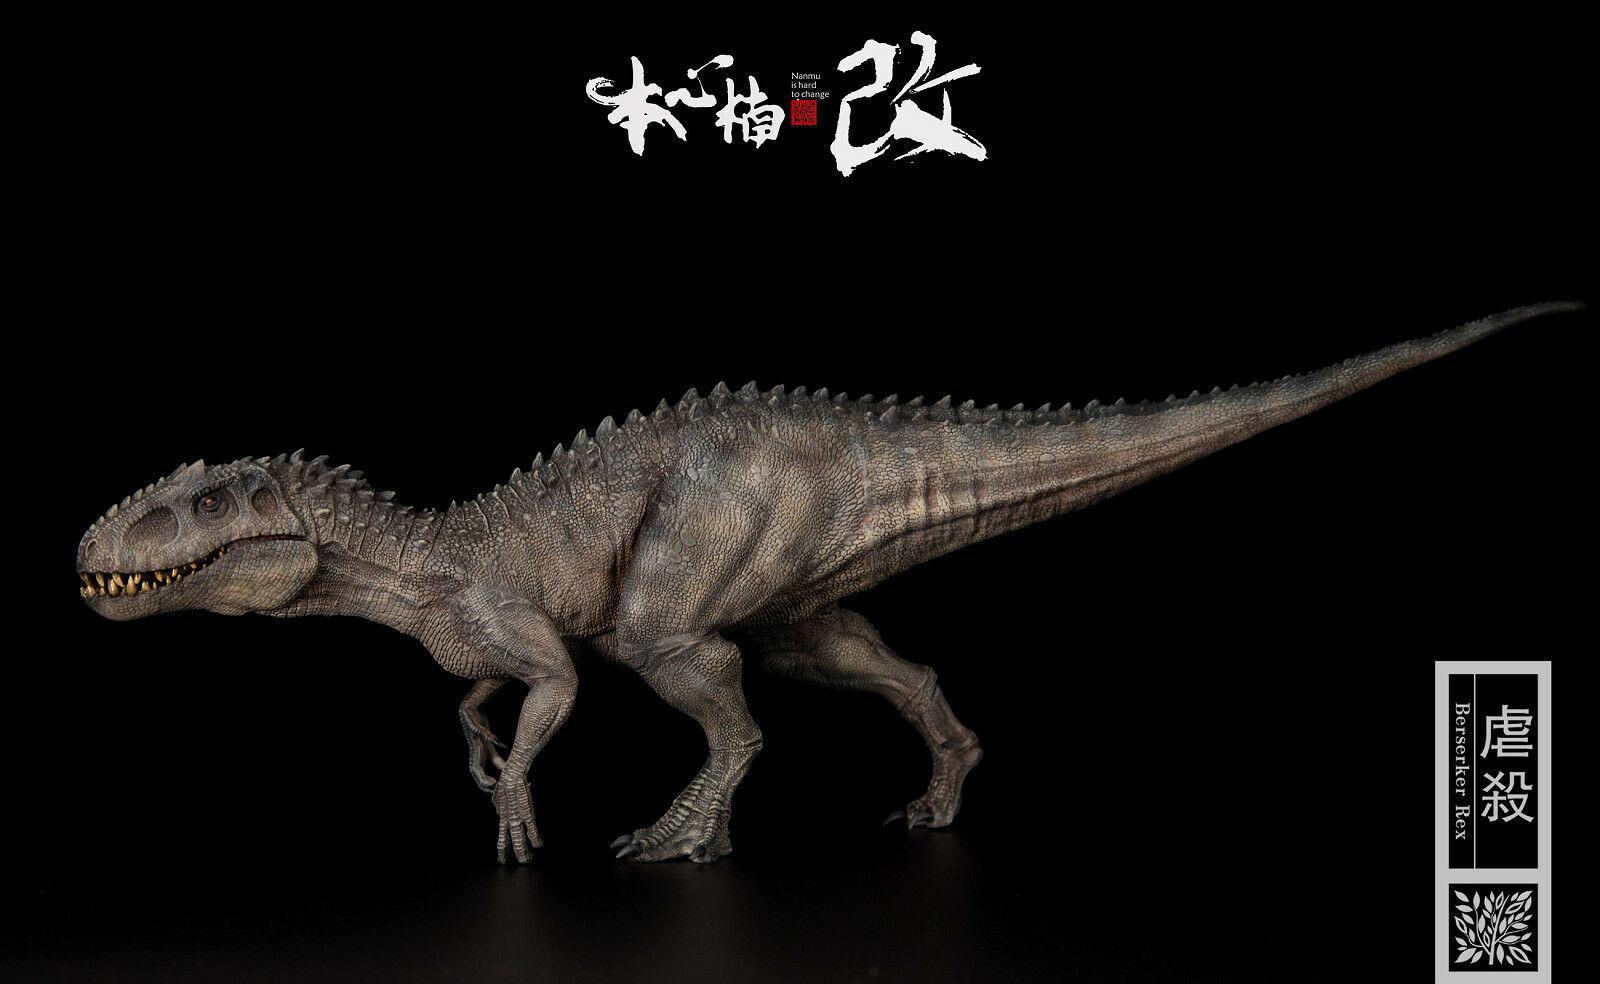 Serie De La Película Figura de Animal Dinosaurio escala 1 35 Modelo 170011 bereserker I-Rex Juguete